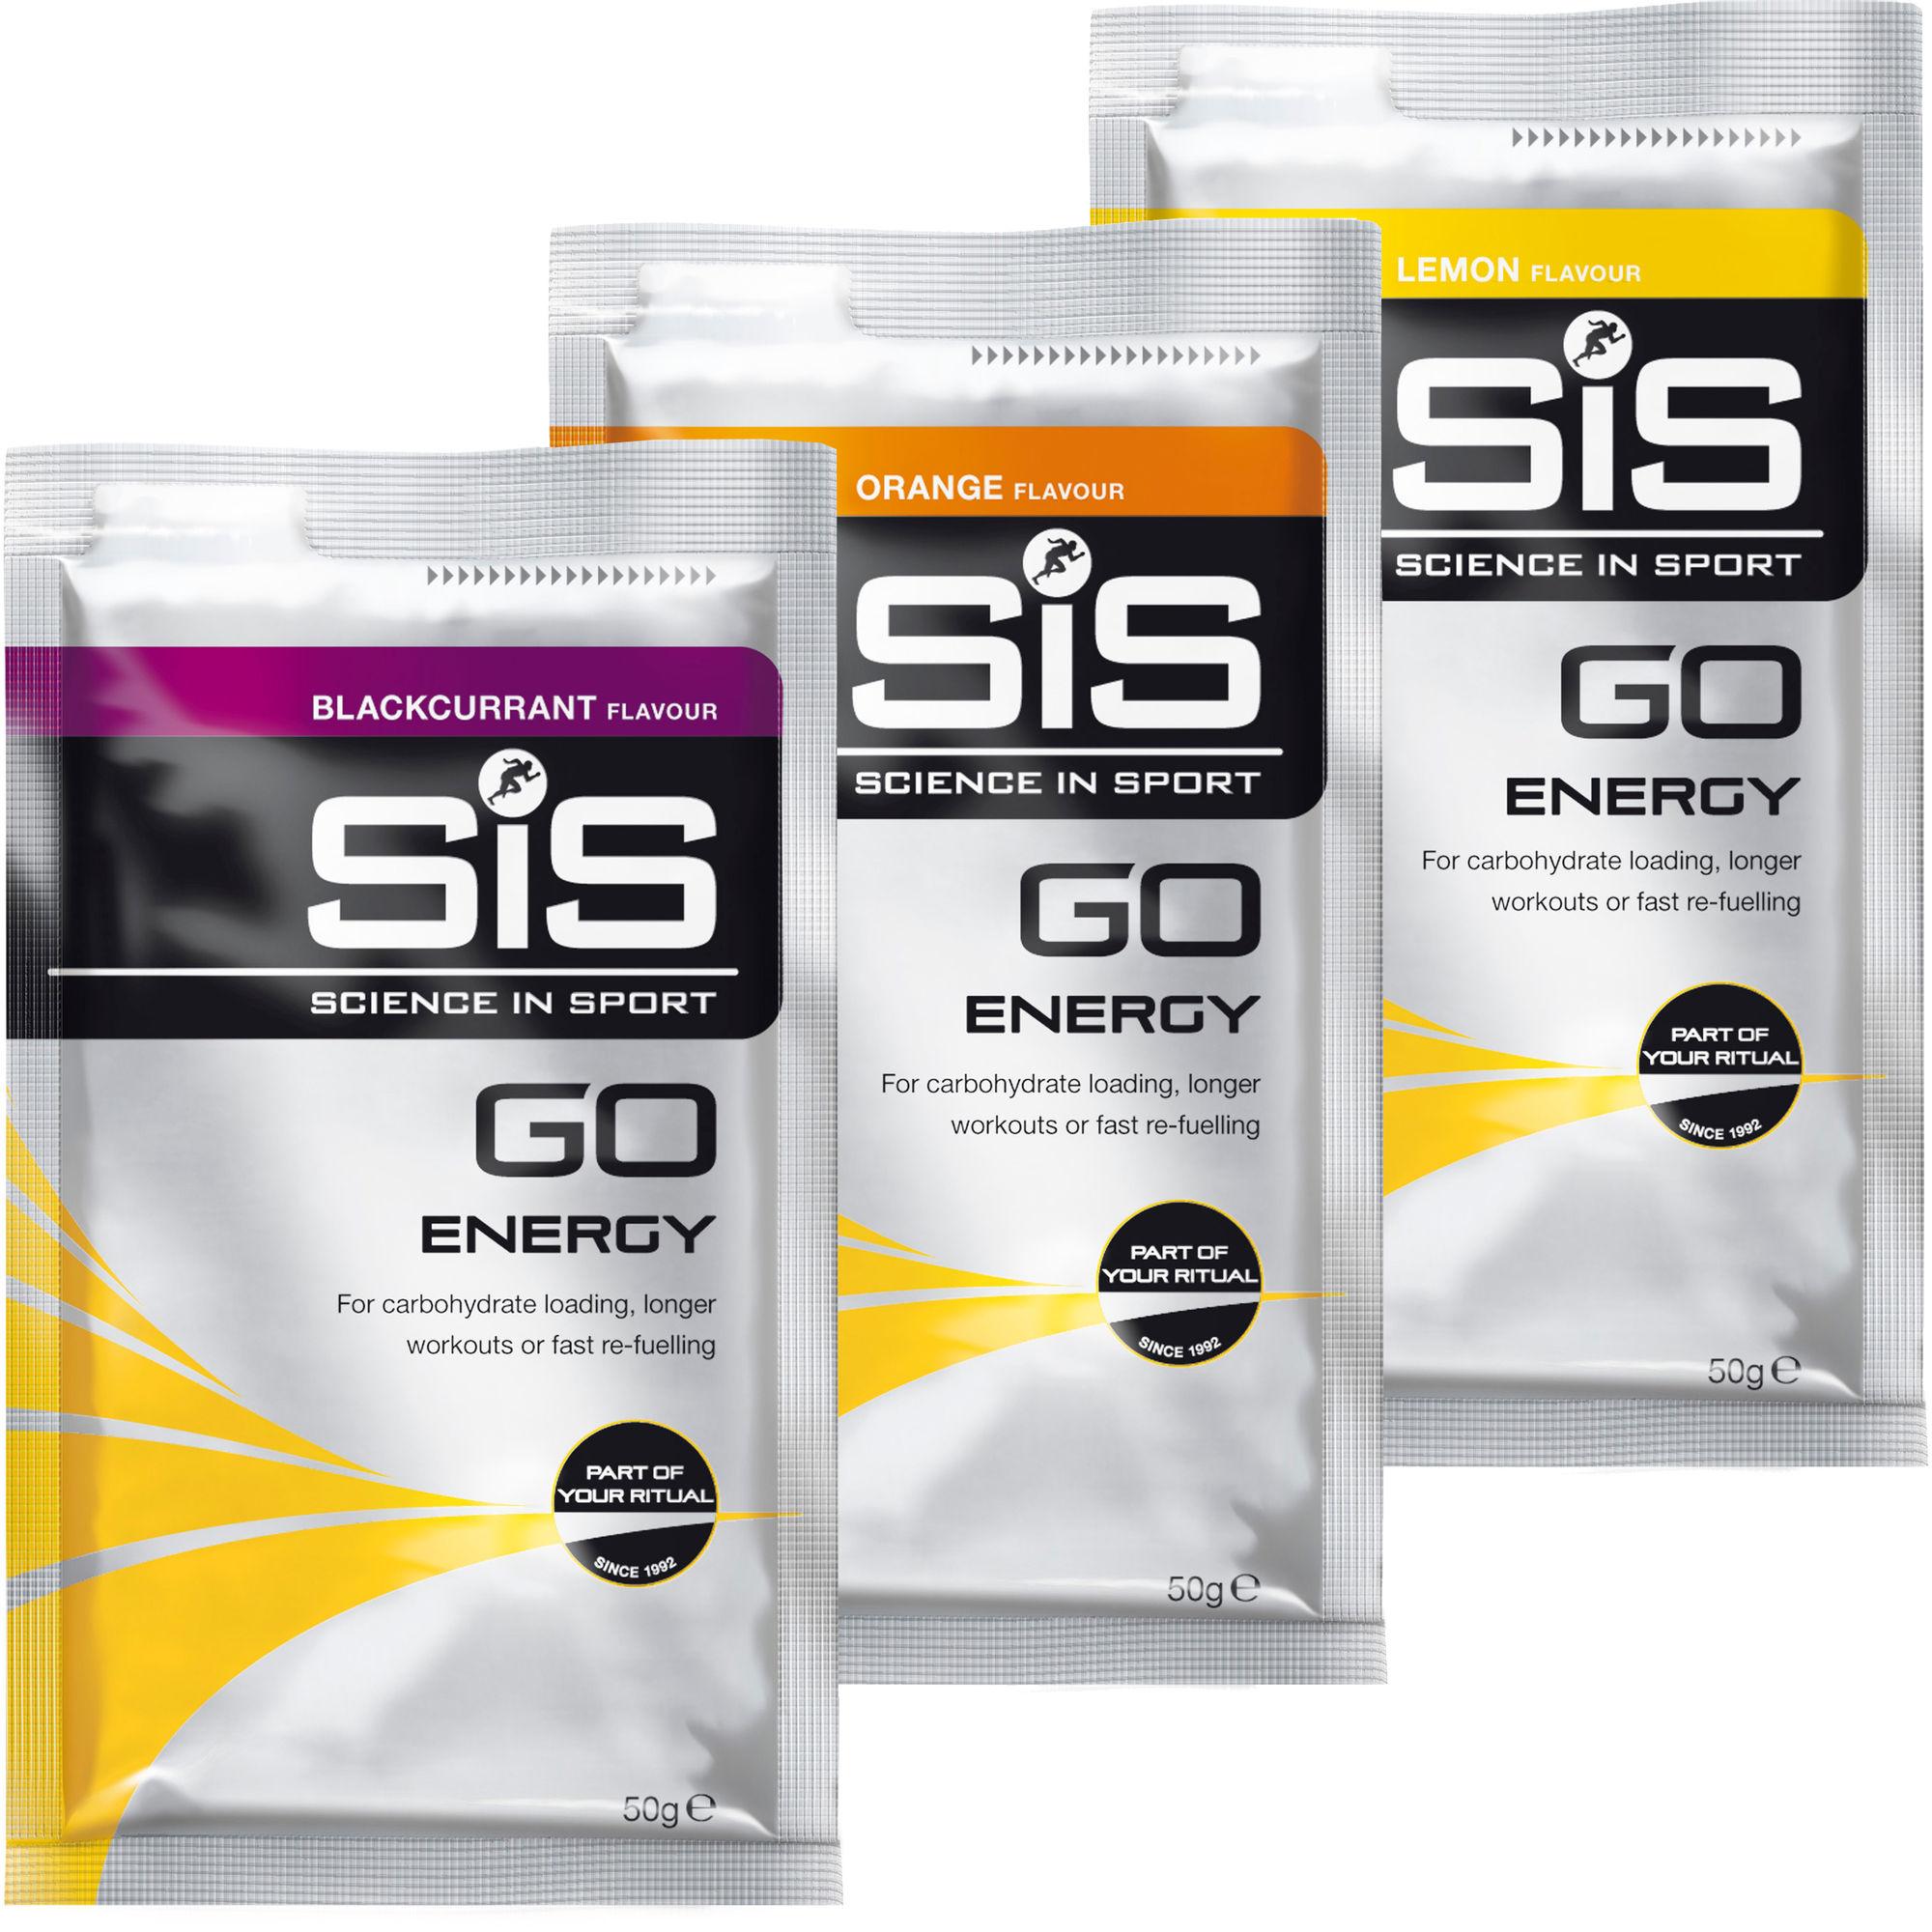 Аксессуары для бега Science in sport  SIS Energy